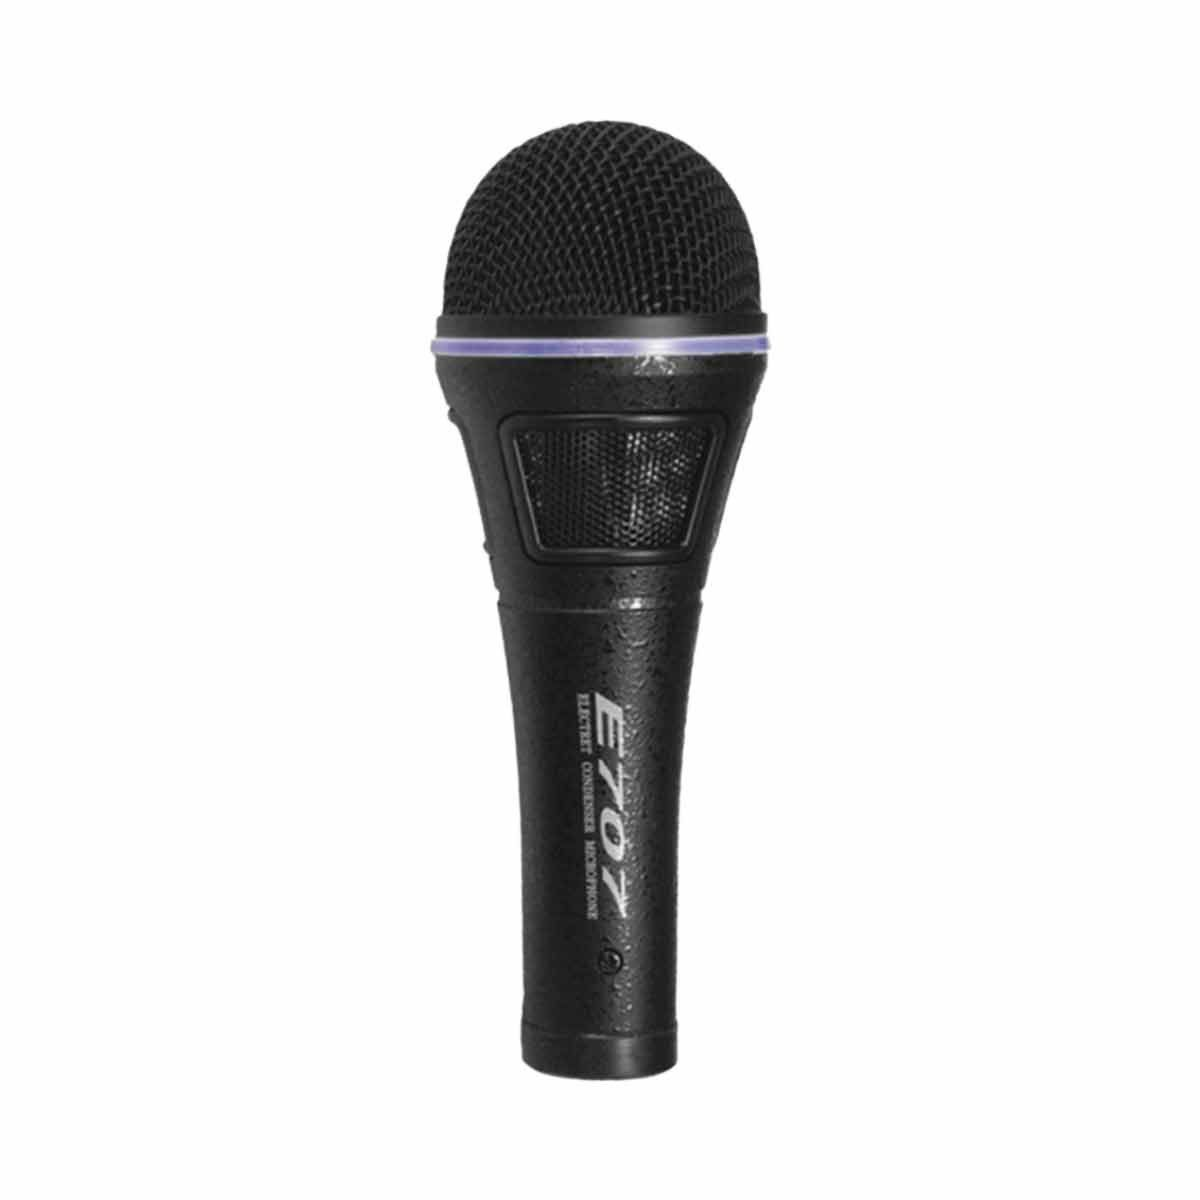 Microfone c/ Fio p/ Instrumentos - E 707 Yoga